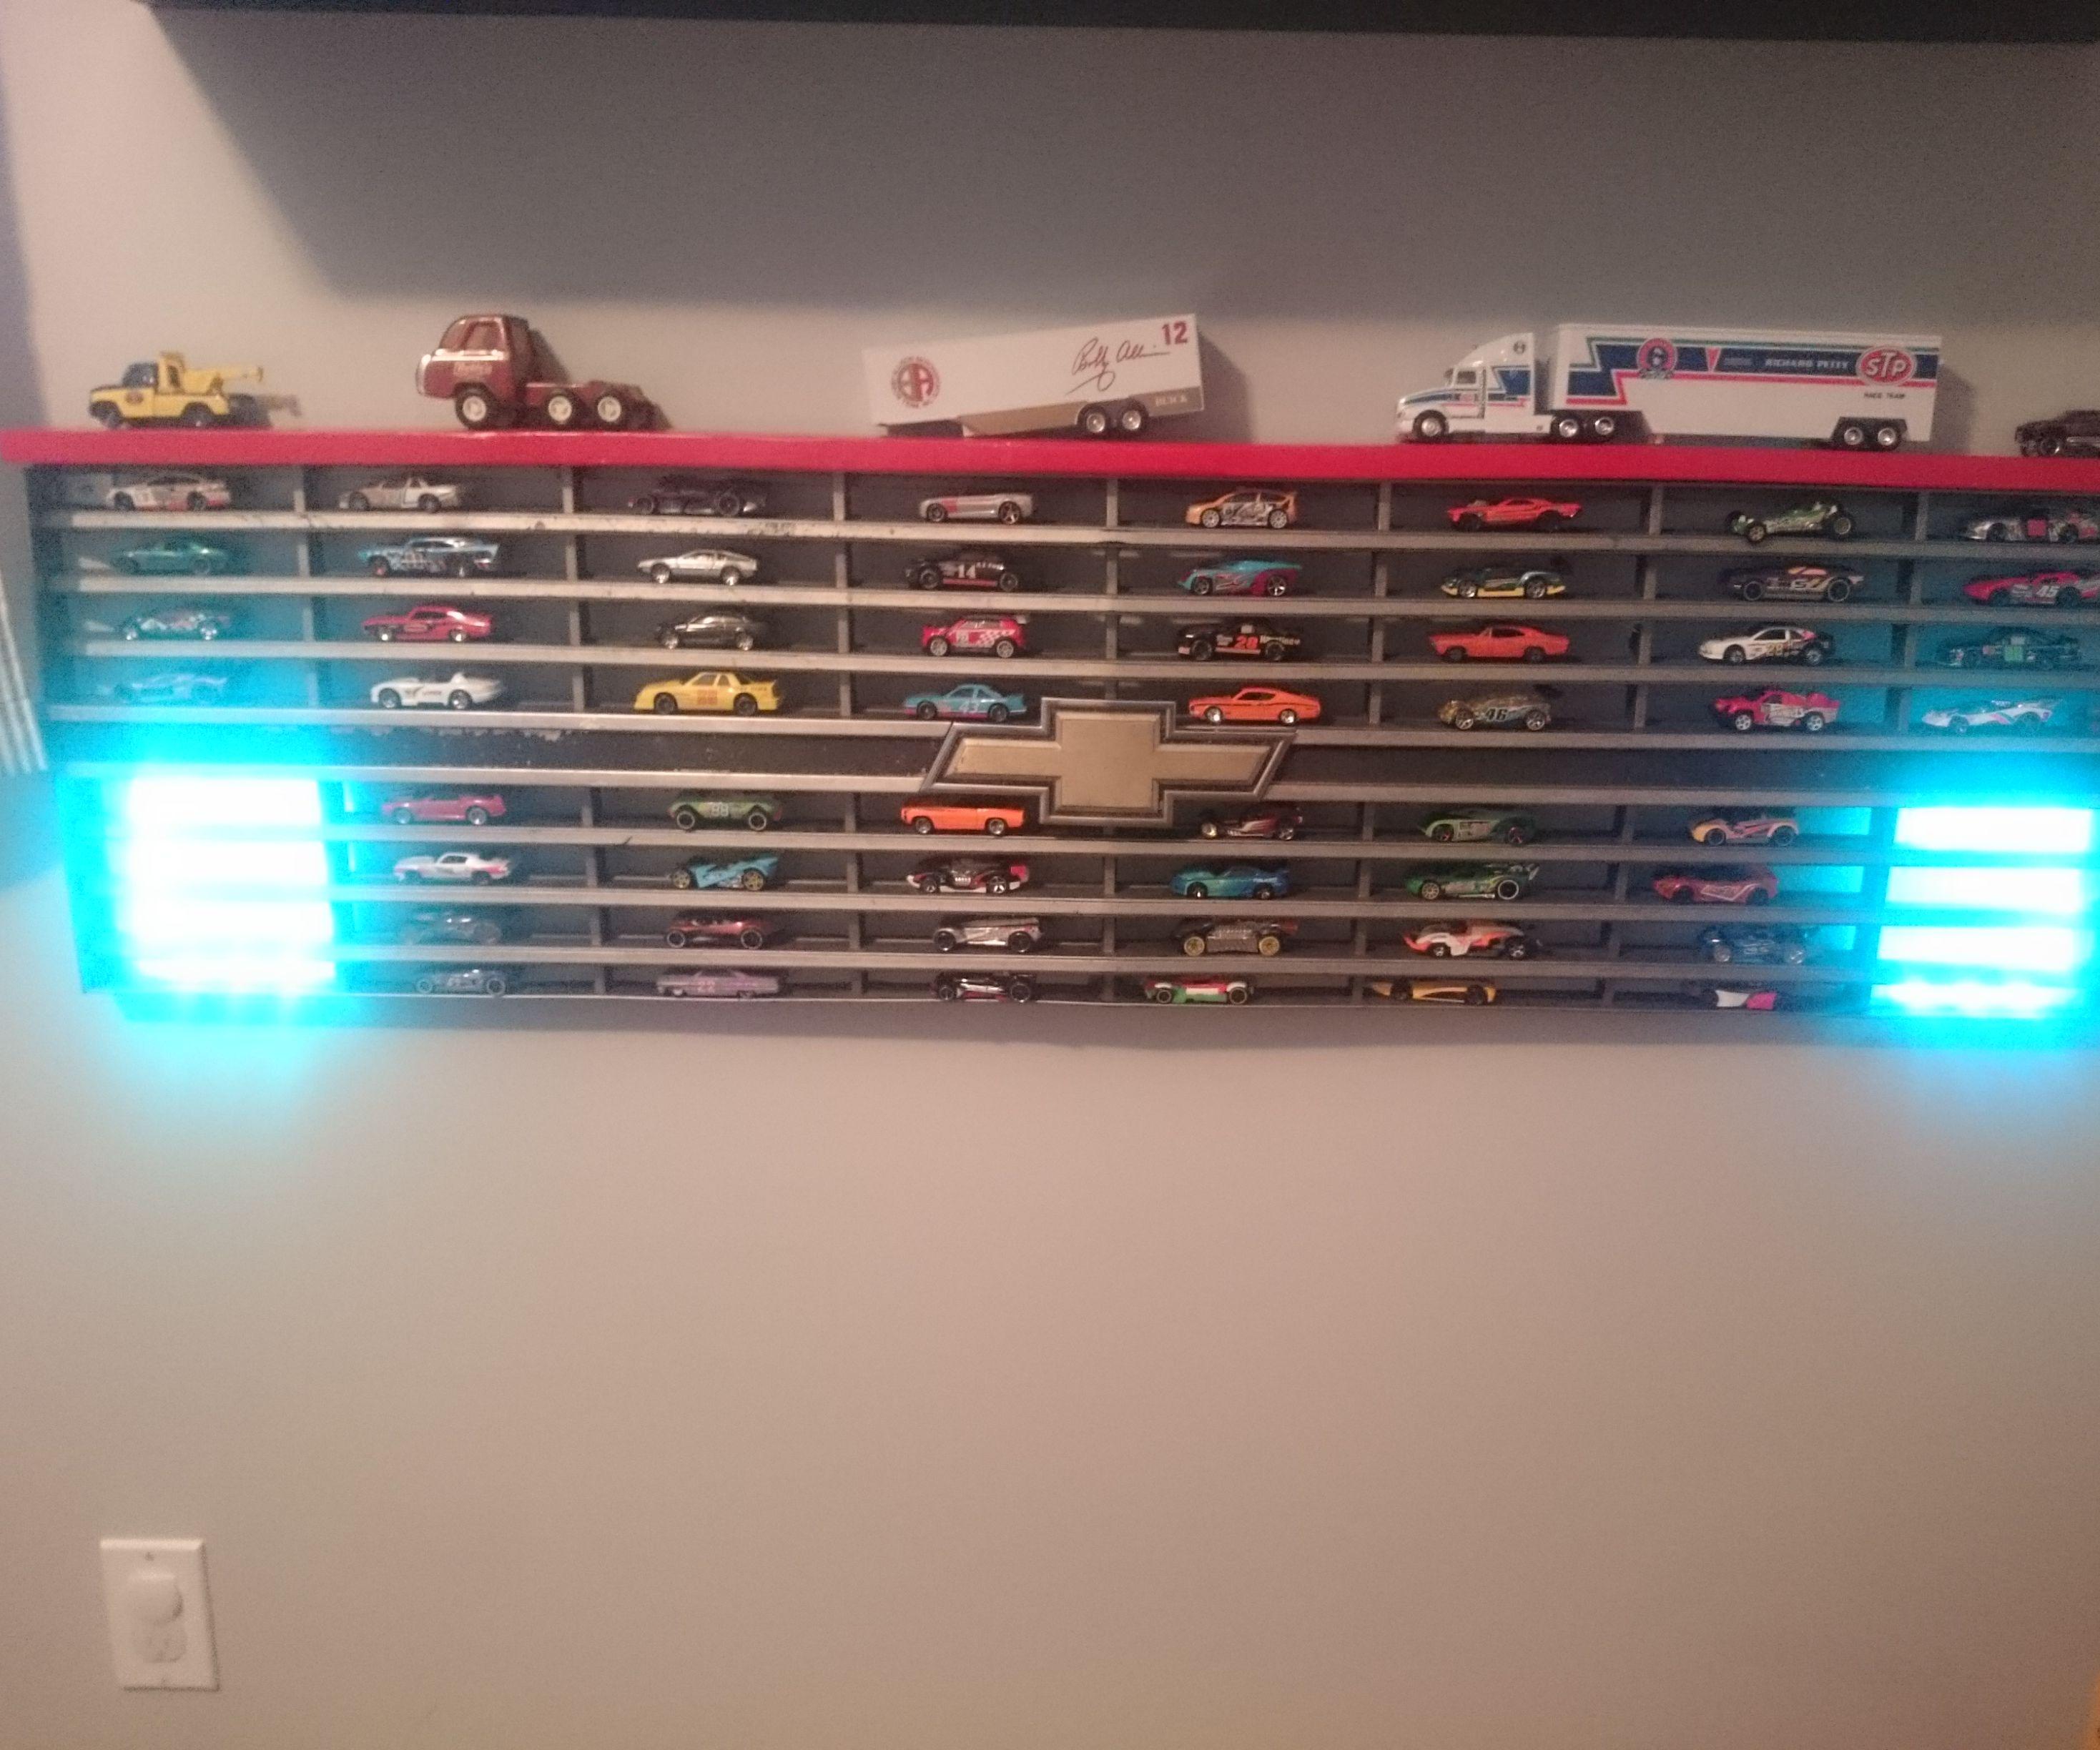 Truck Grille Display Shelf